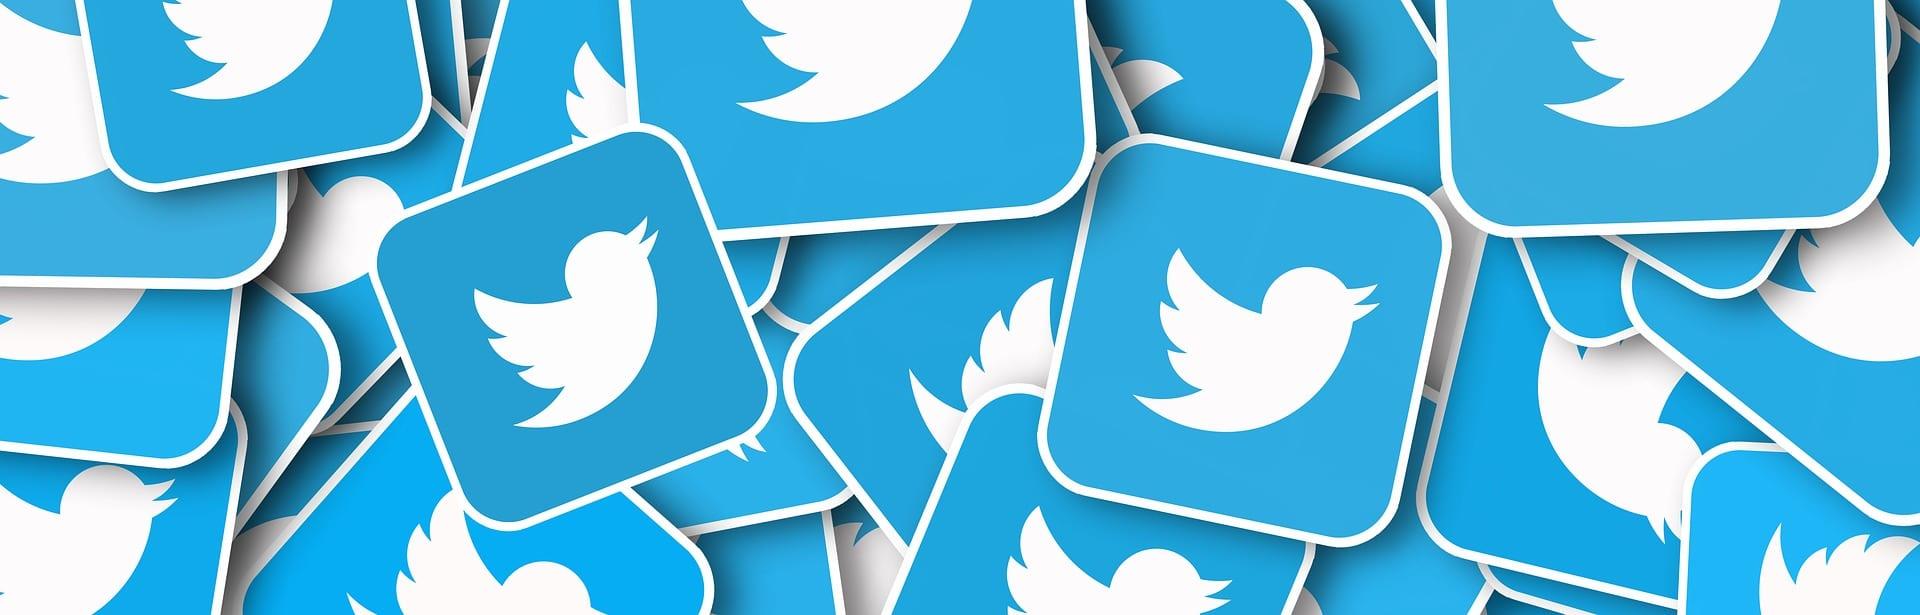 twitter-güvenlik-açığı-twitter-logo